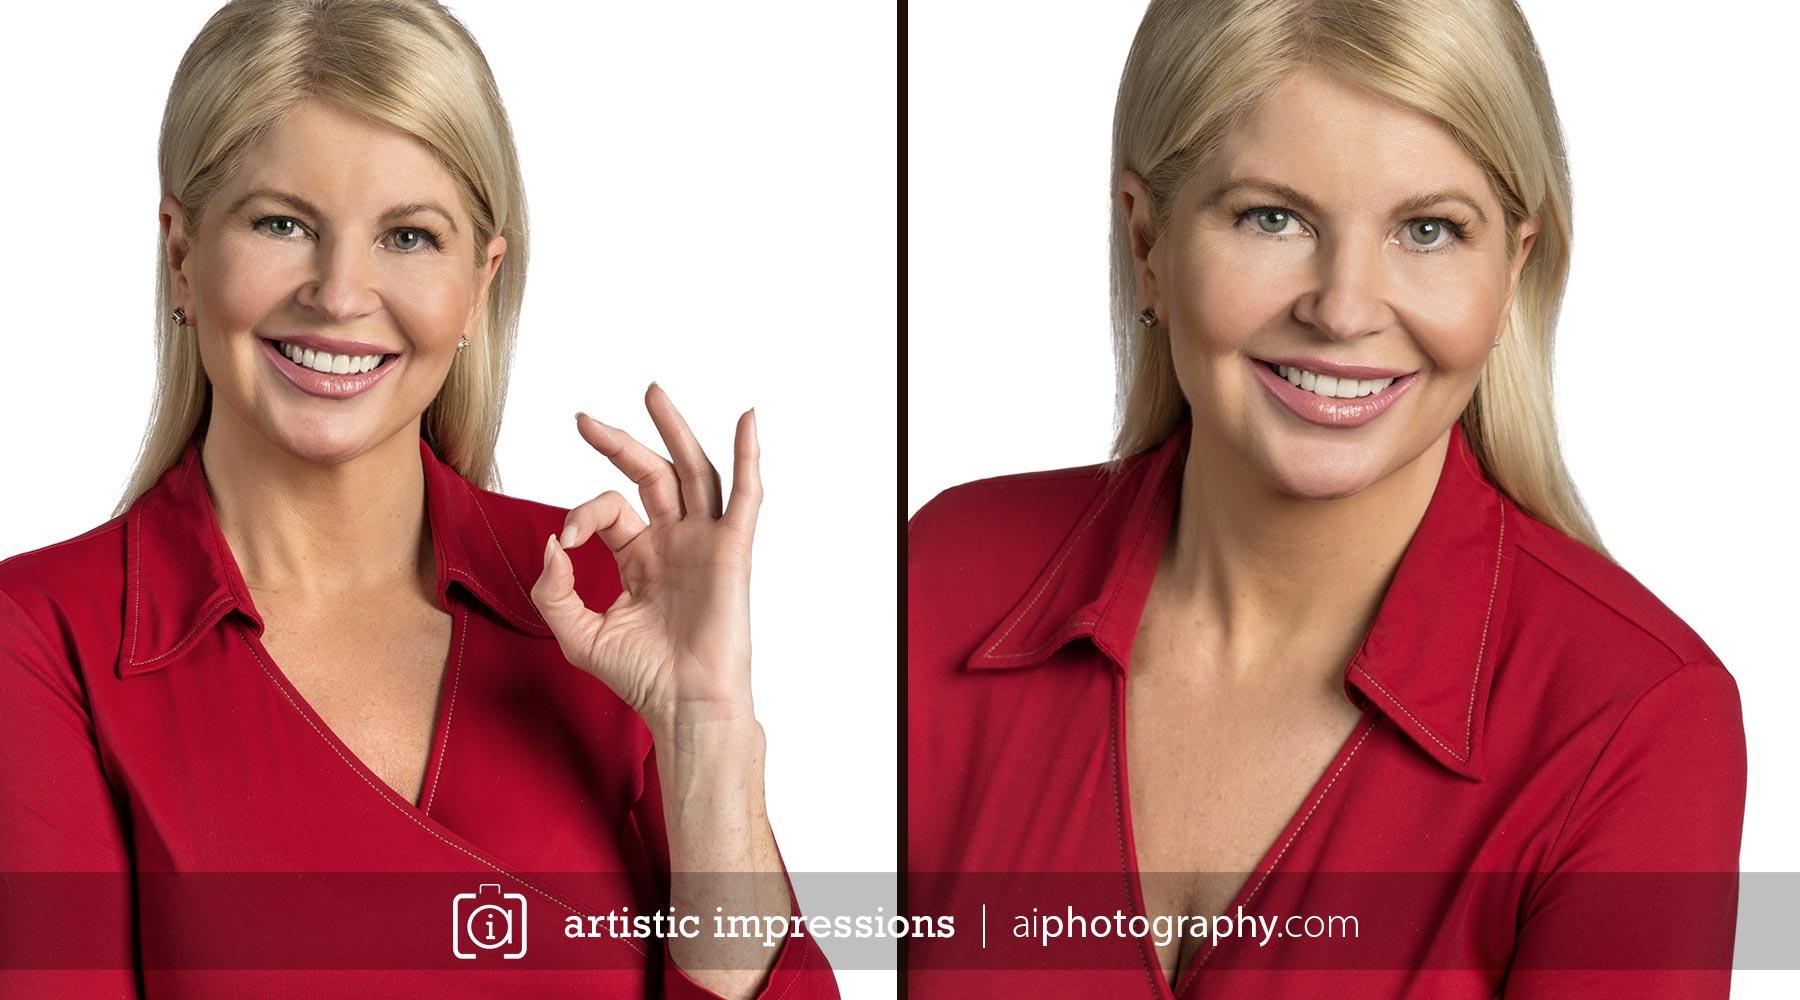 winnipeg-photographer-corporate-professional-headshot-business